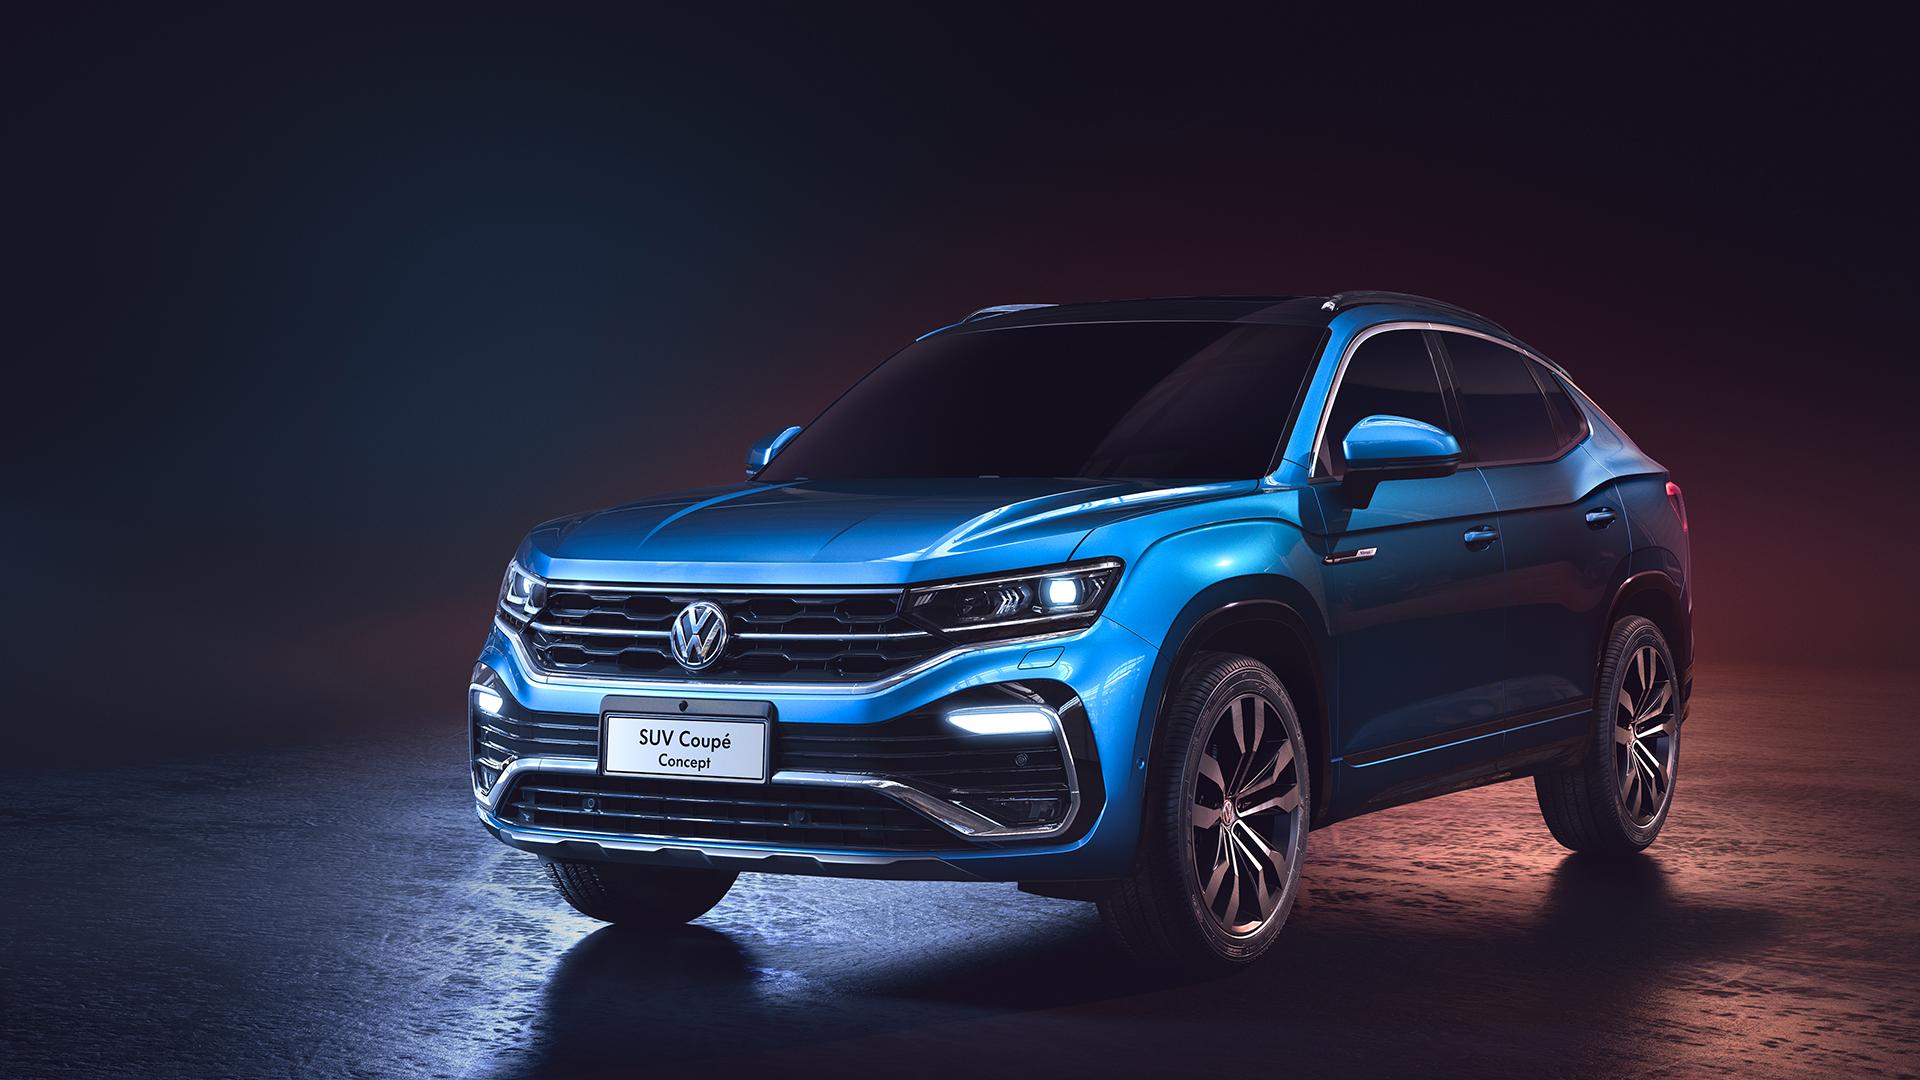 Volkswagen Suv Coupe Concept 2019 Wallpaper